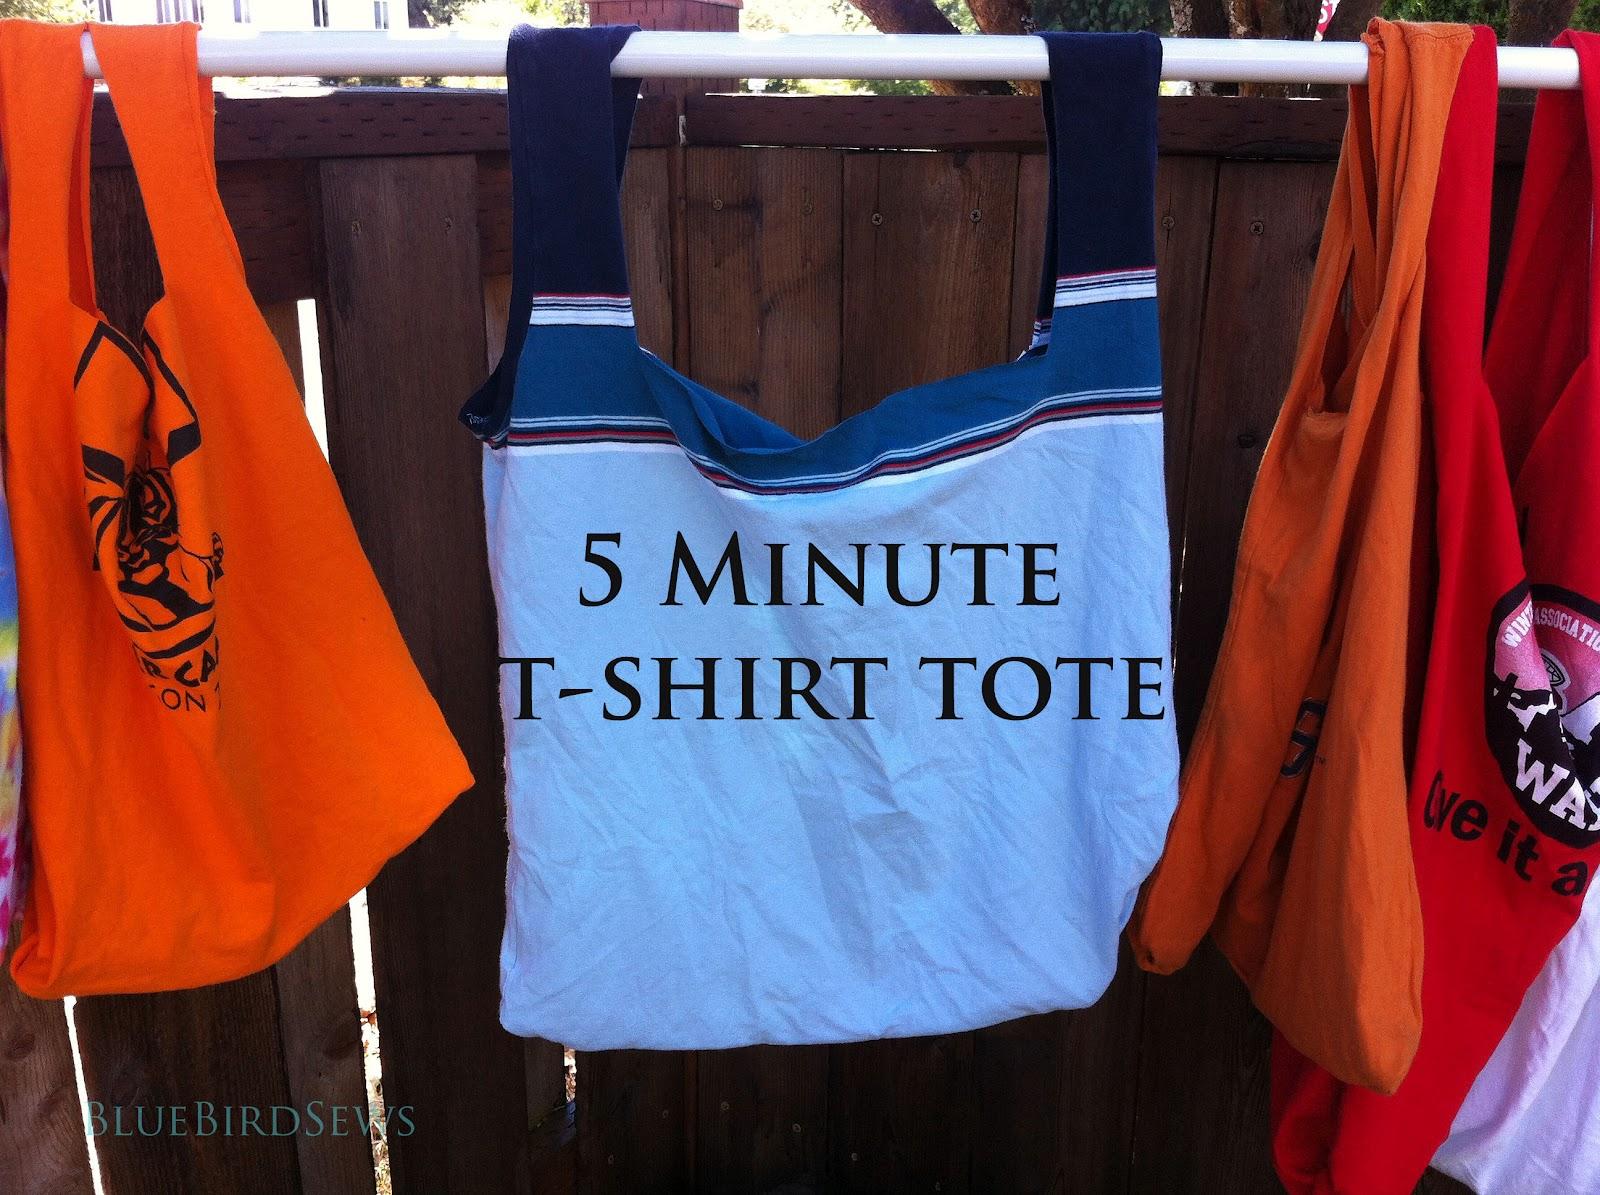 Blue Bird Sews 5 Minute T Shirt Tote Bag Tutorial